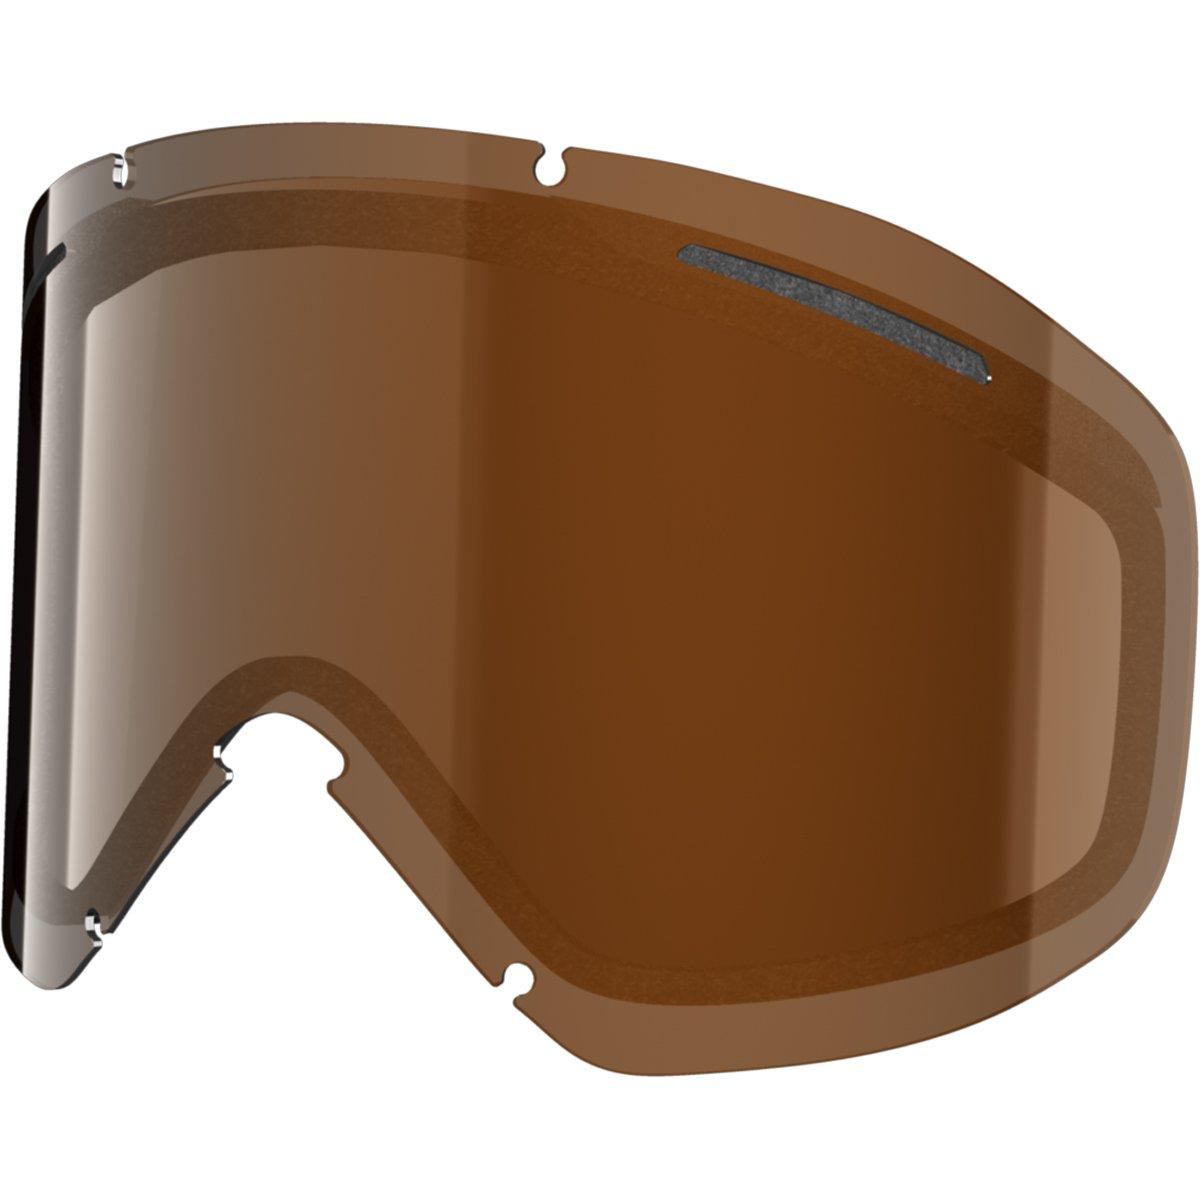 Oakley O2 XL Replacement Lens, Black Iridium